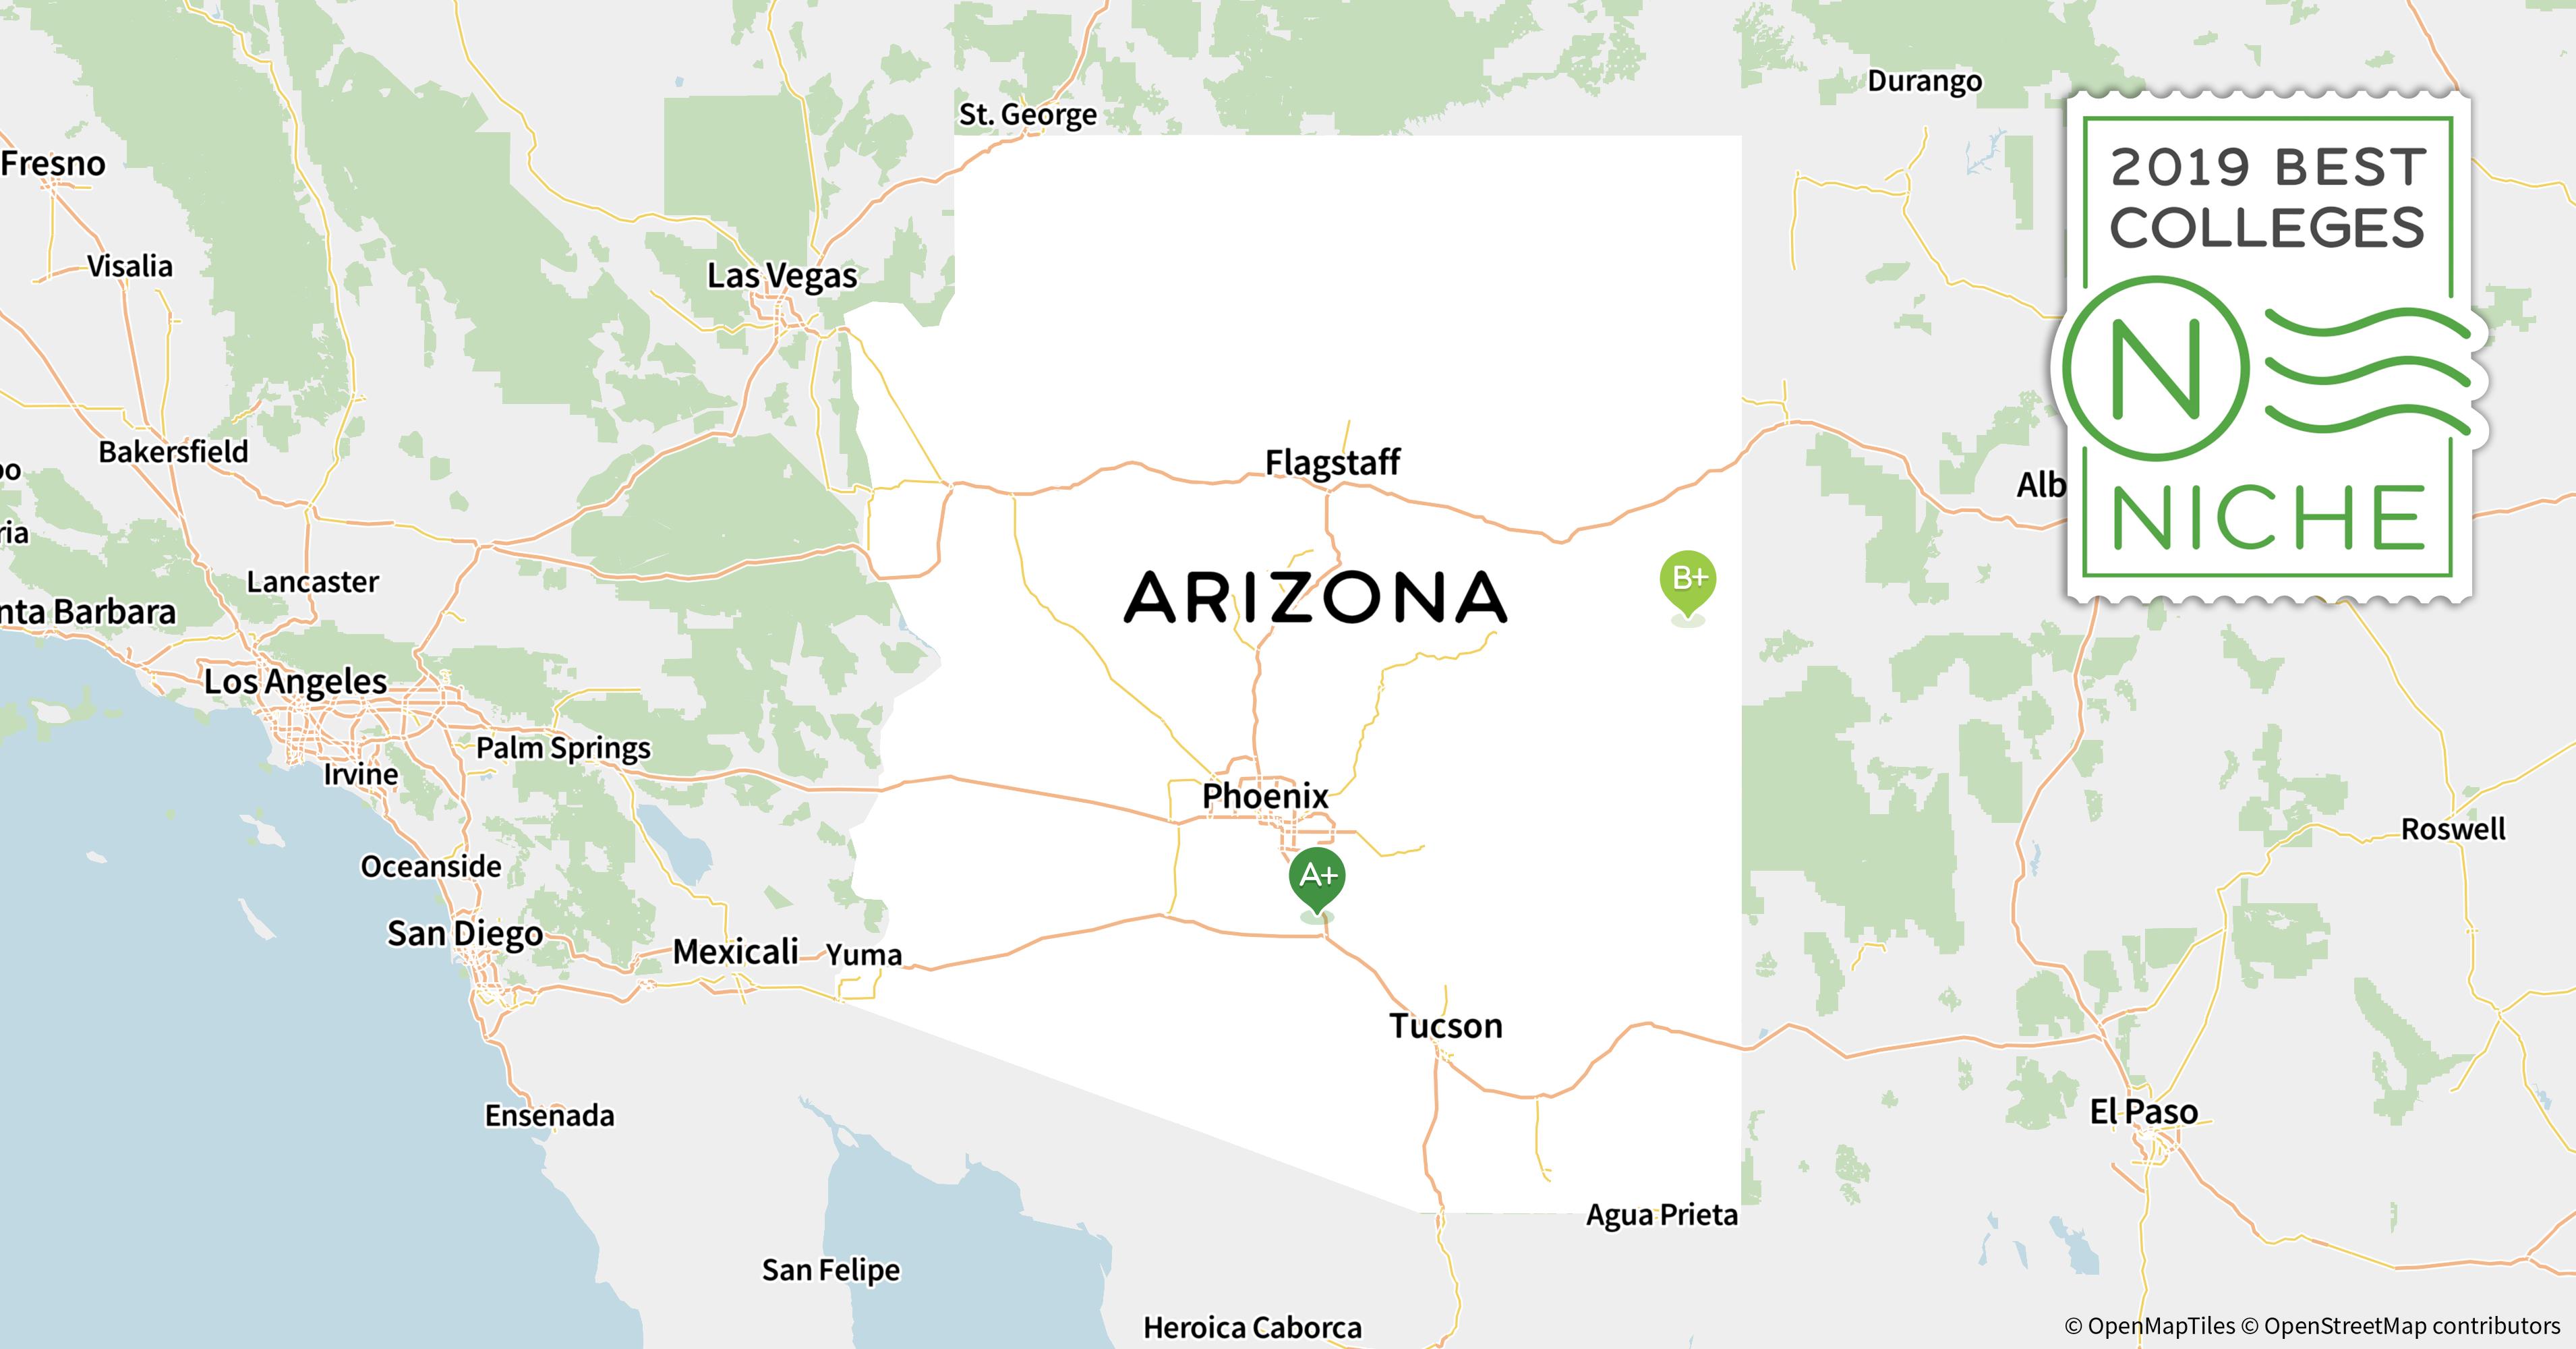 2019 Best Arizona Film Schools And Photography Programs Niche